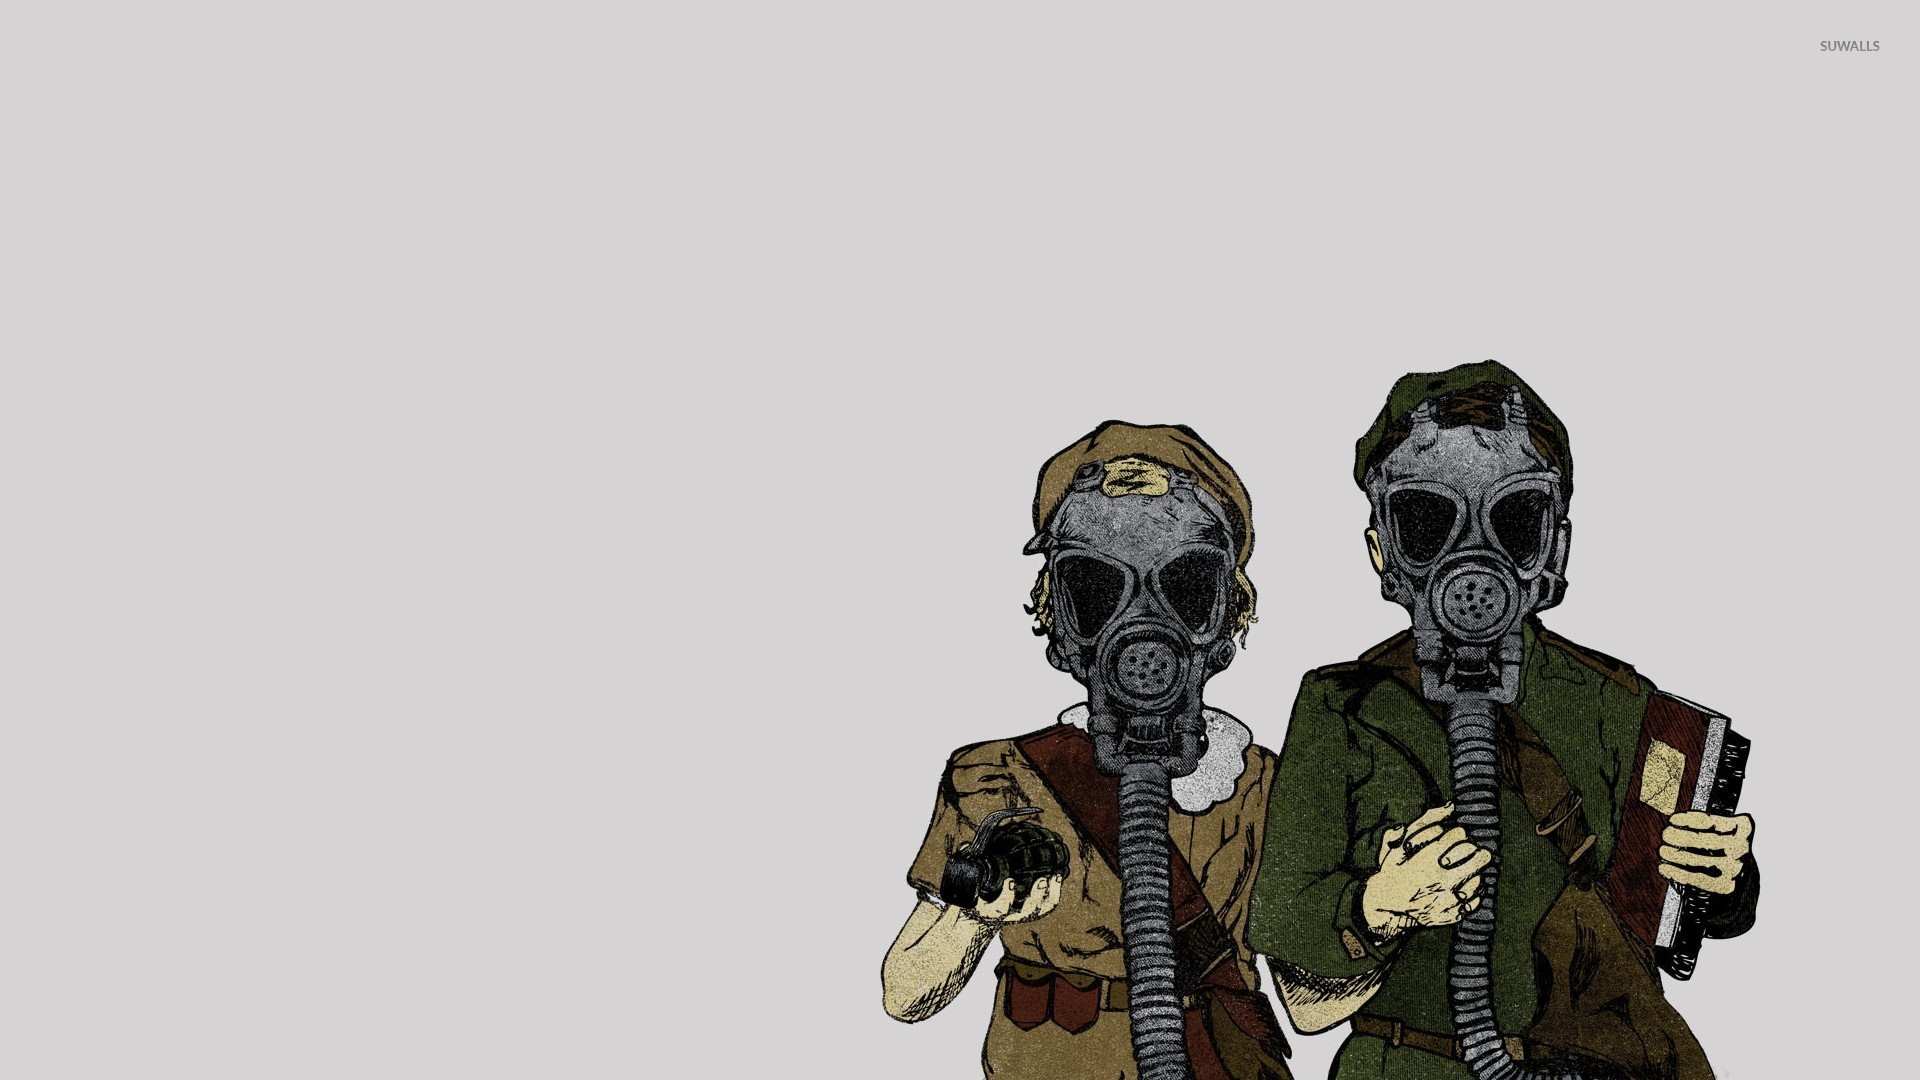 Men With Gas Masks Wallpaper Digital Art Wallpapers 43998